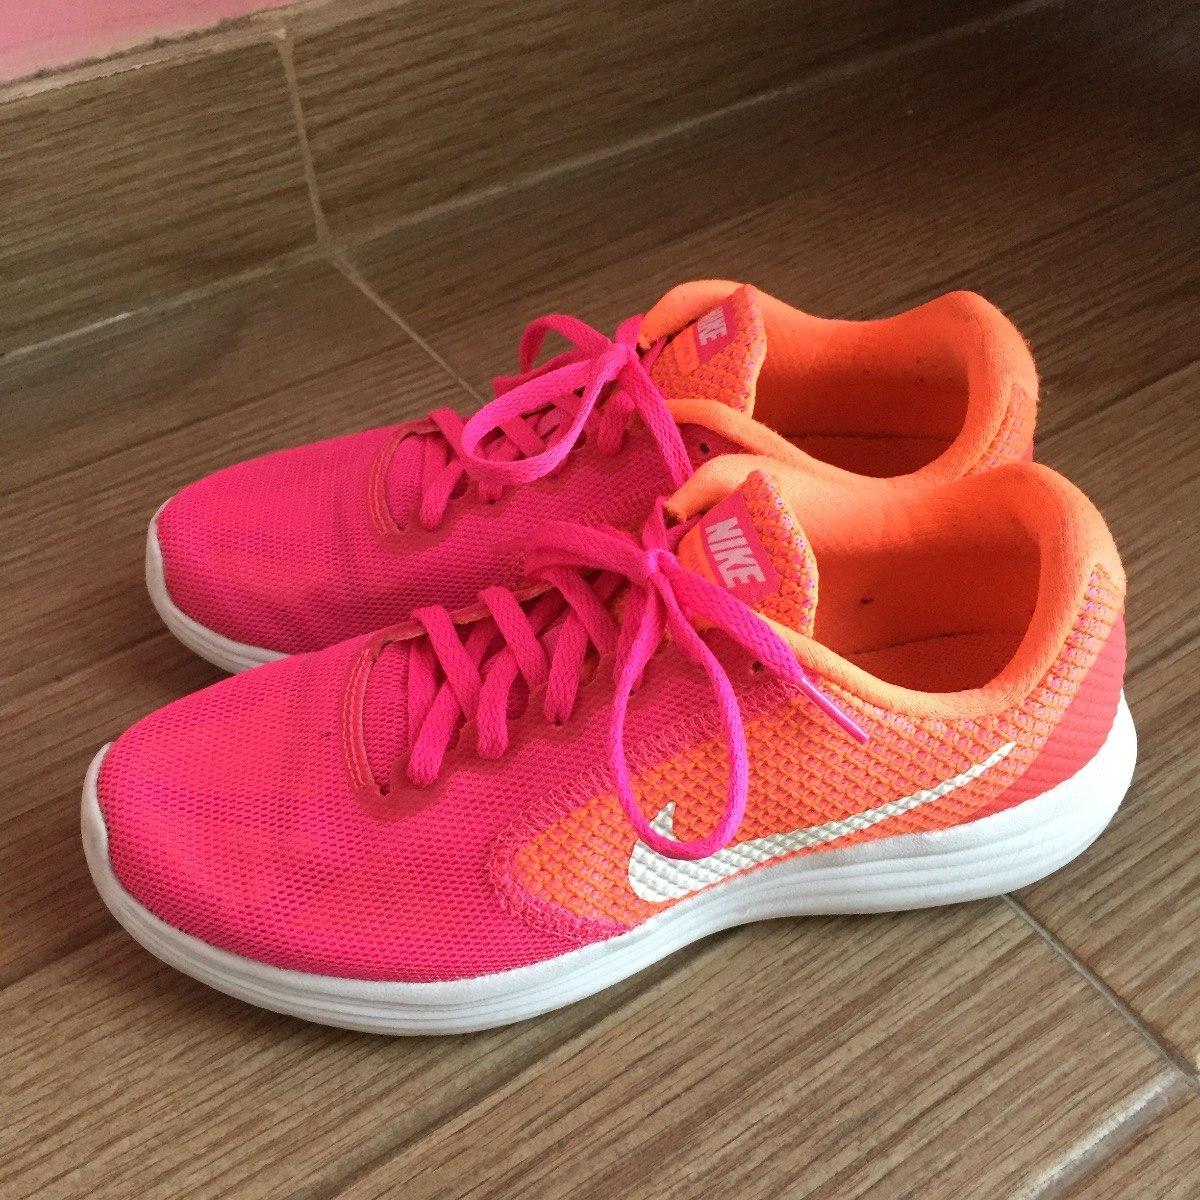 huge discount 62564 92e09 tenis nike revolution 3 neon rosa naranja mujer para correr. Cargando zoom.